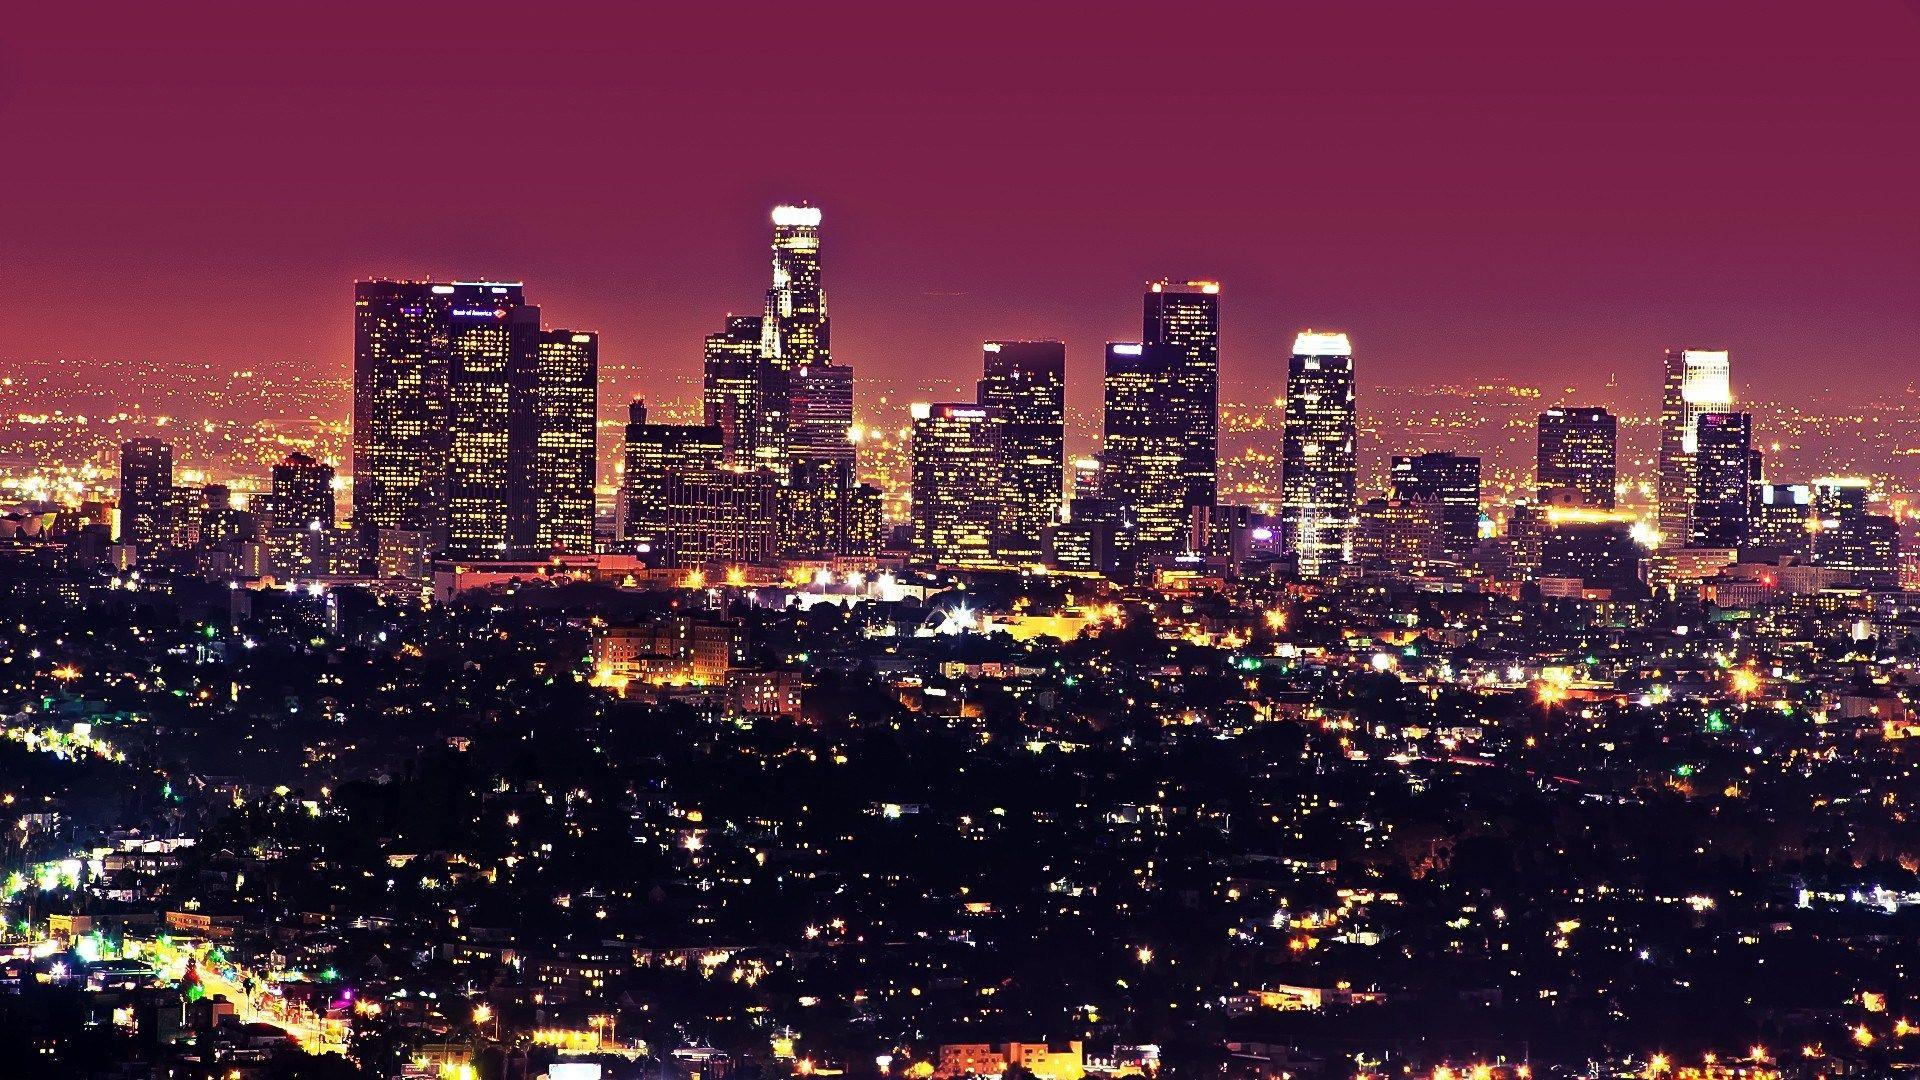 Los Angeles Wallpaper Images Los Angeles Tourism Los Angeles At Night Los Angeles Wallpaper